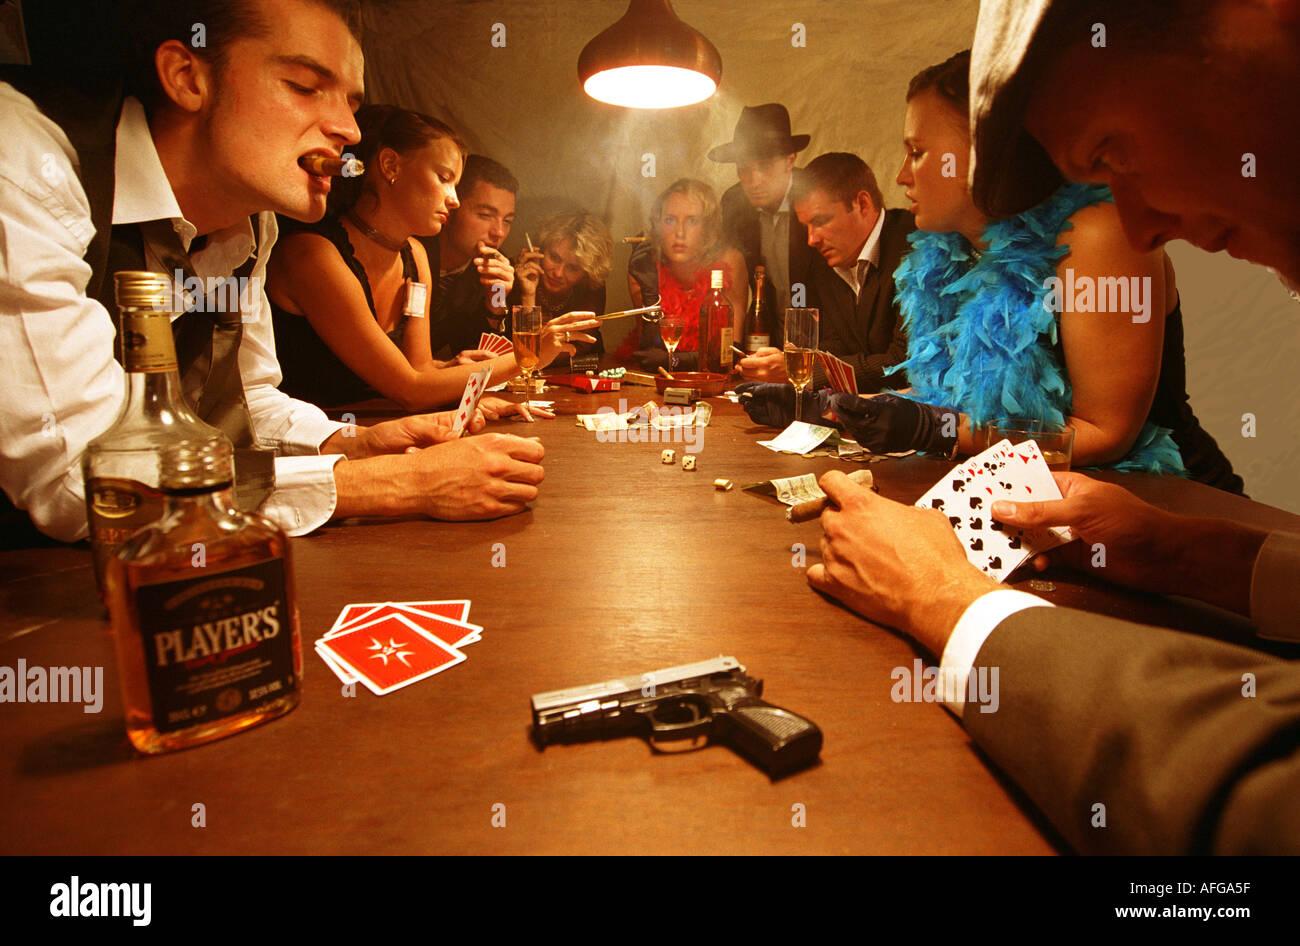 Poker alcohol